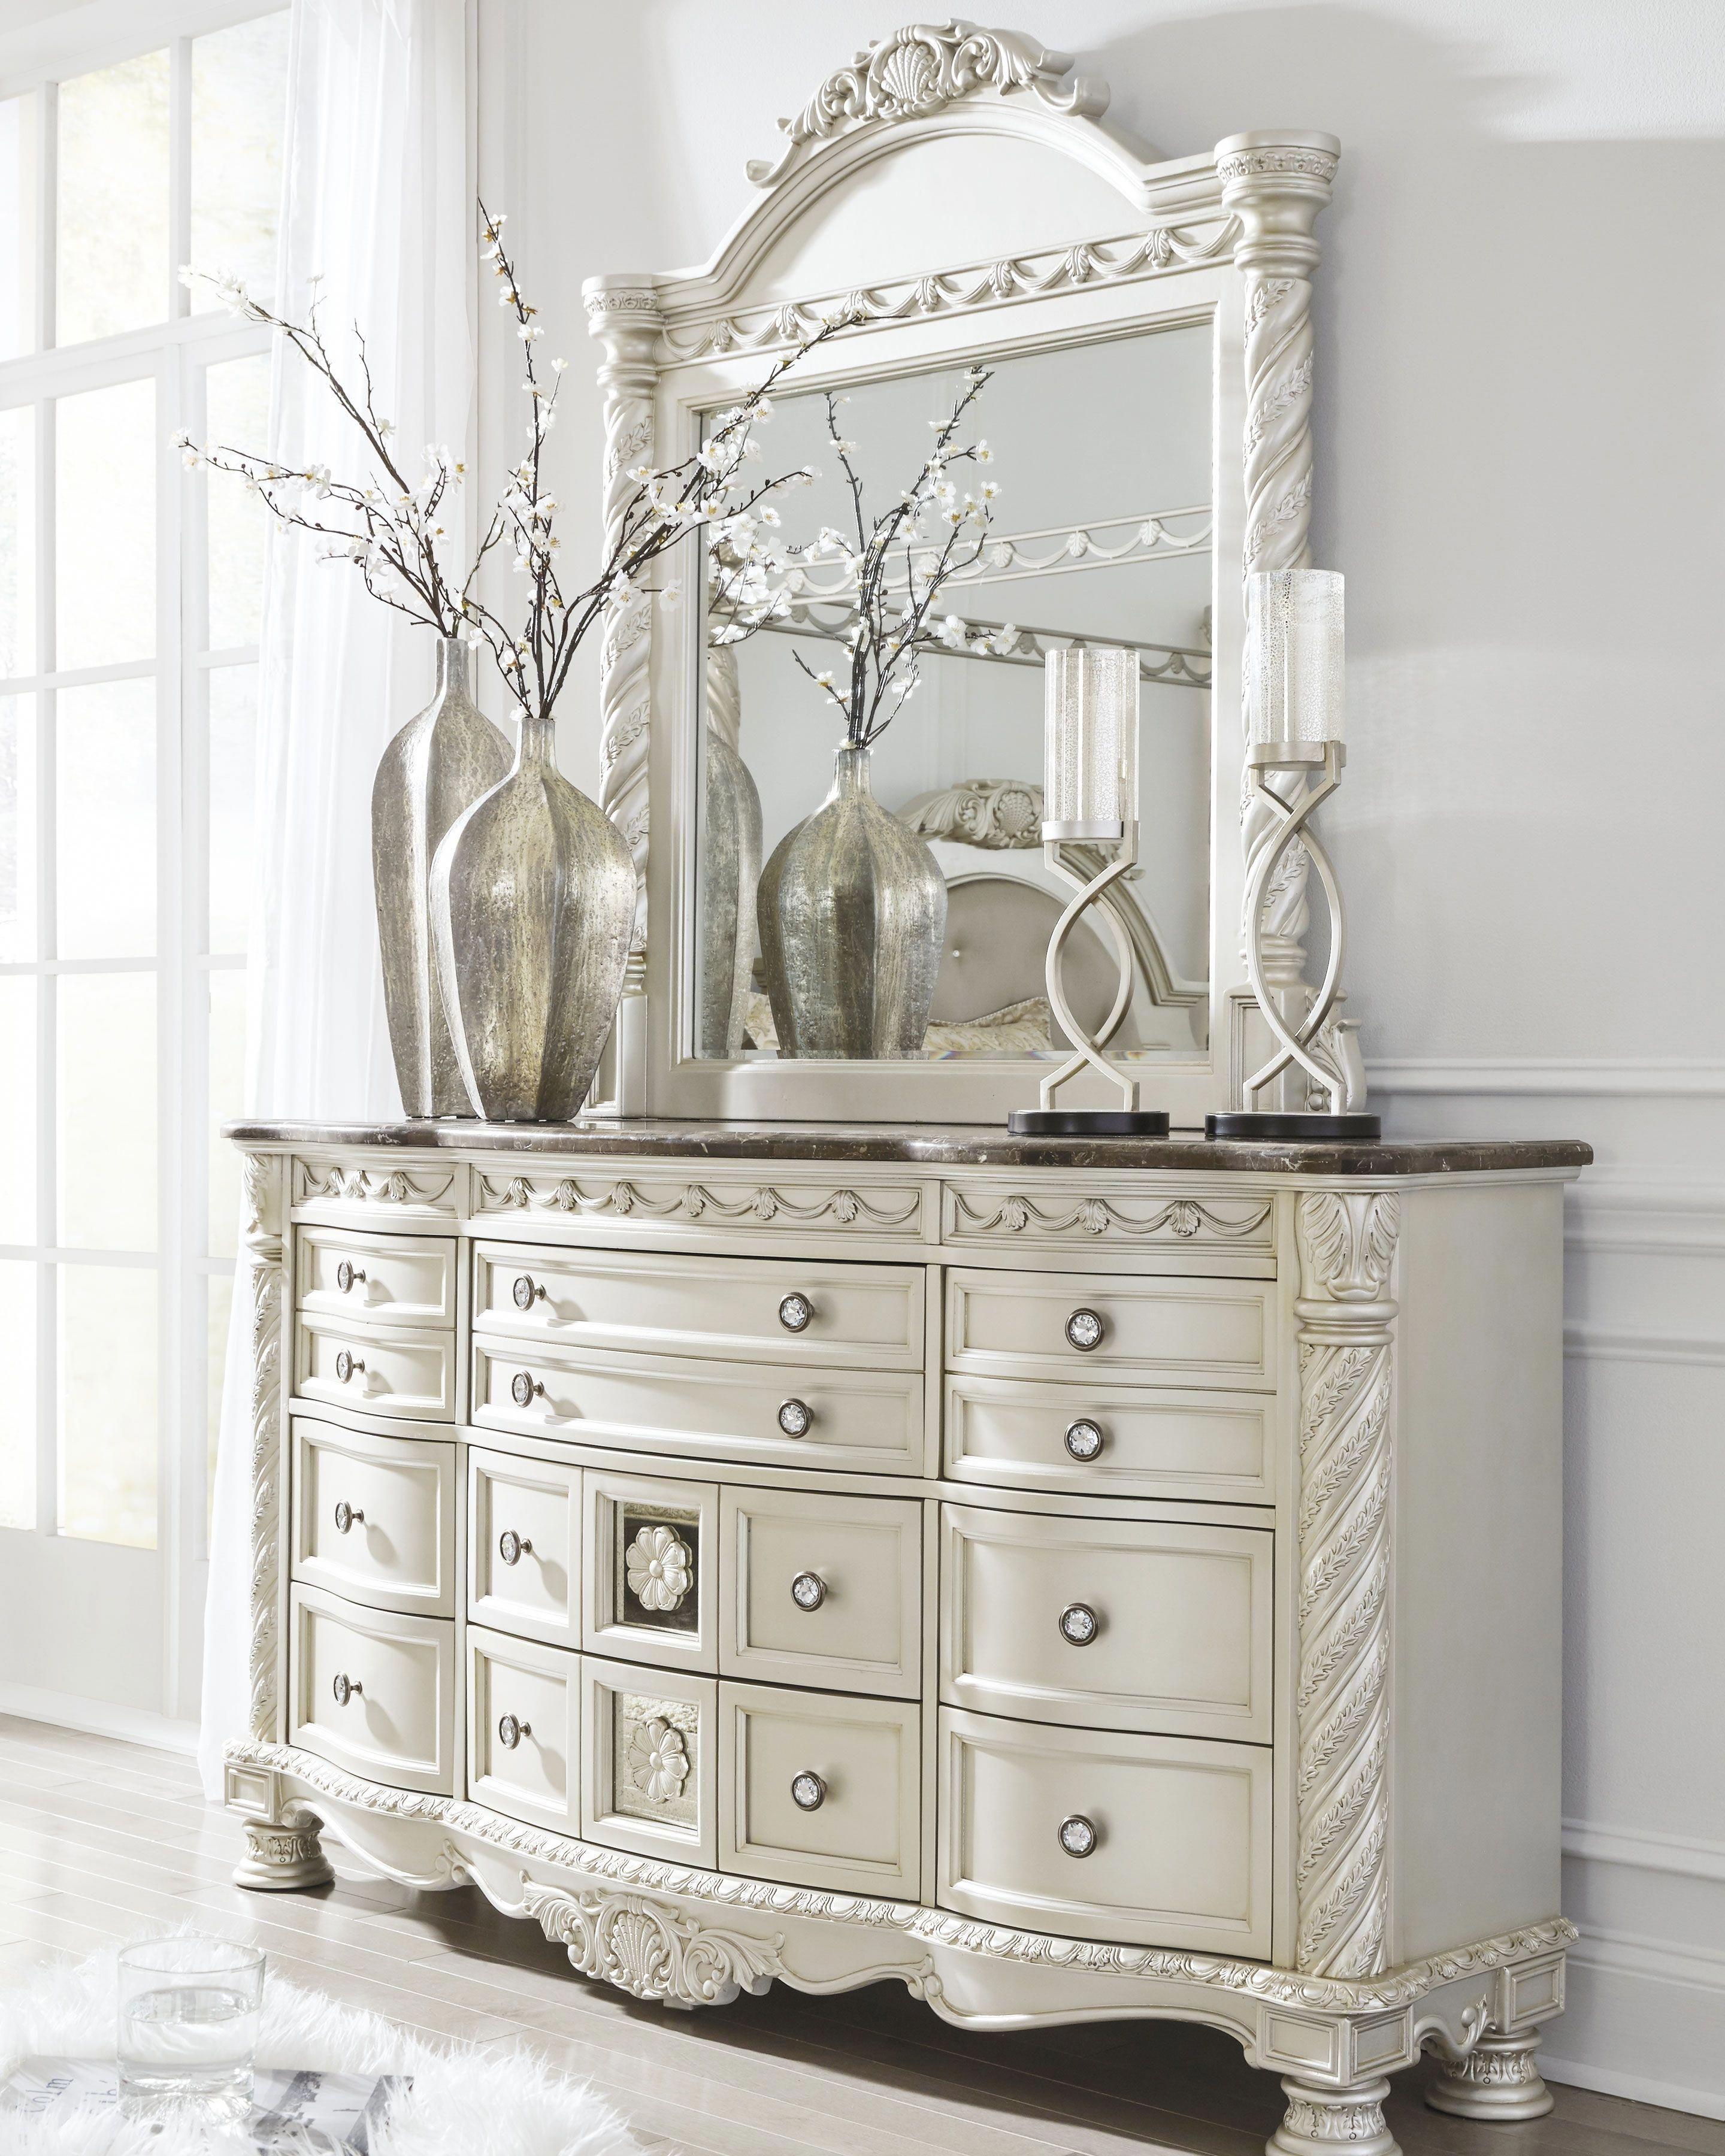 Cassimore Dresser And Mirror Pearl Silver Dark Brown Shabbychicbedrooms Shabby Chic Dresser Shabby Chic Room Shabby Chic Bedrooms